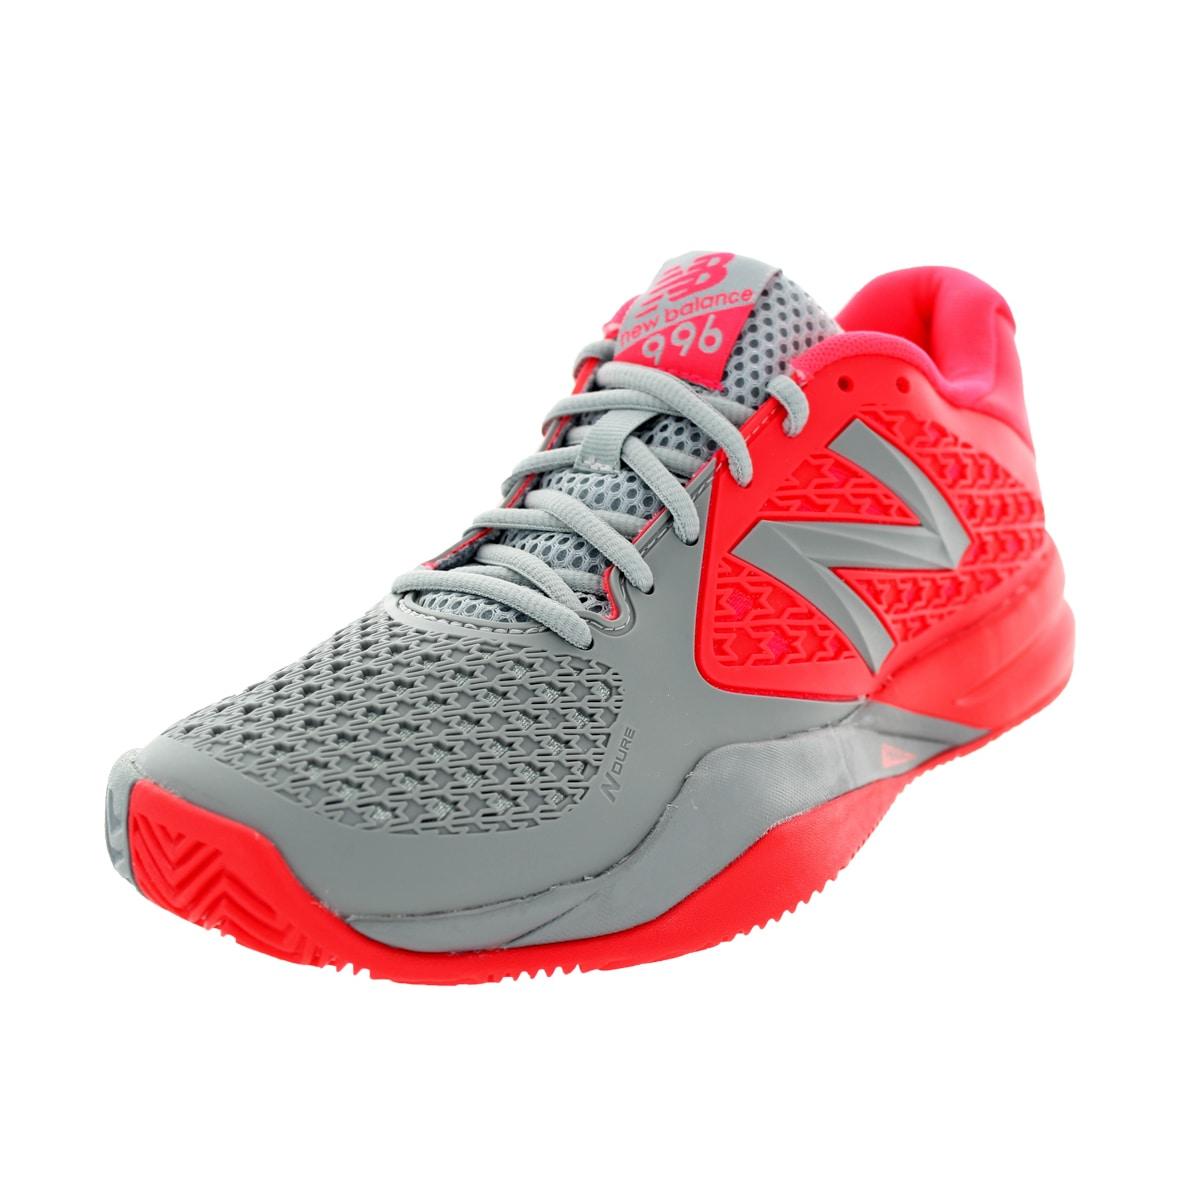 Restaurar guirnalda neumonía  New Balance Women's 996V2 Coral Pink With Grey Tennis Shoe - Overstock -  12344342